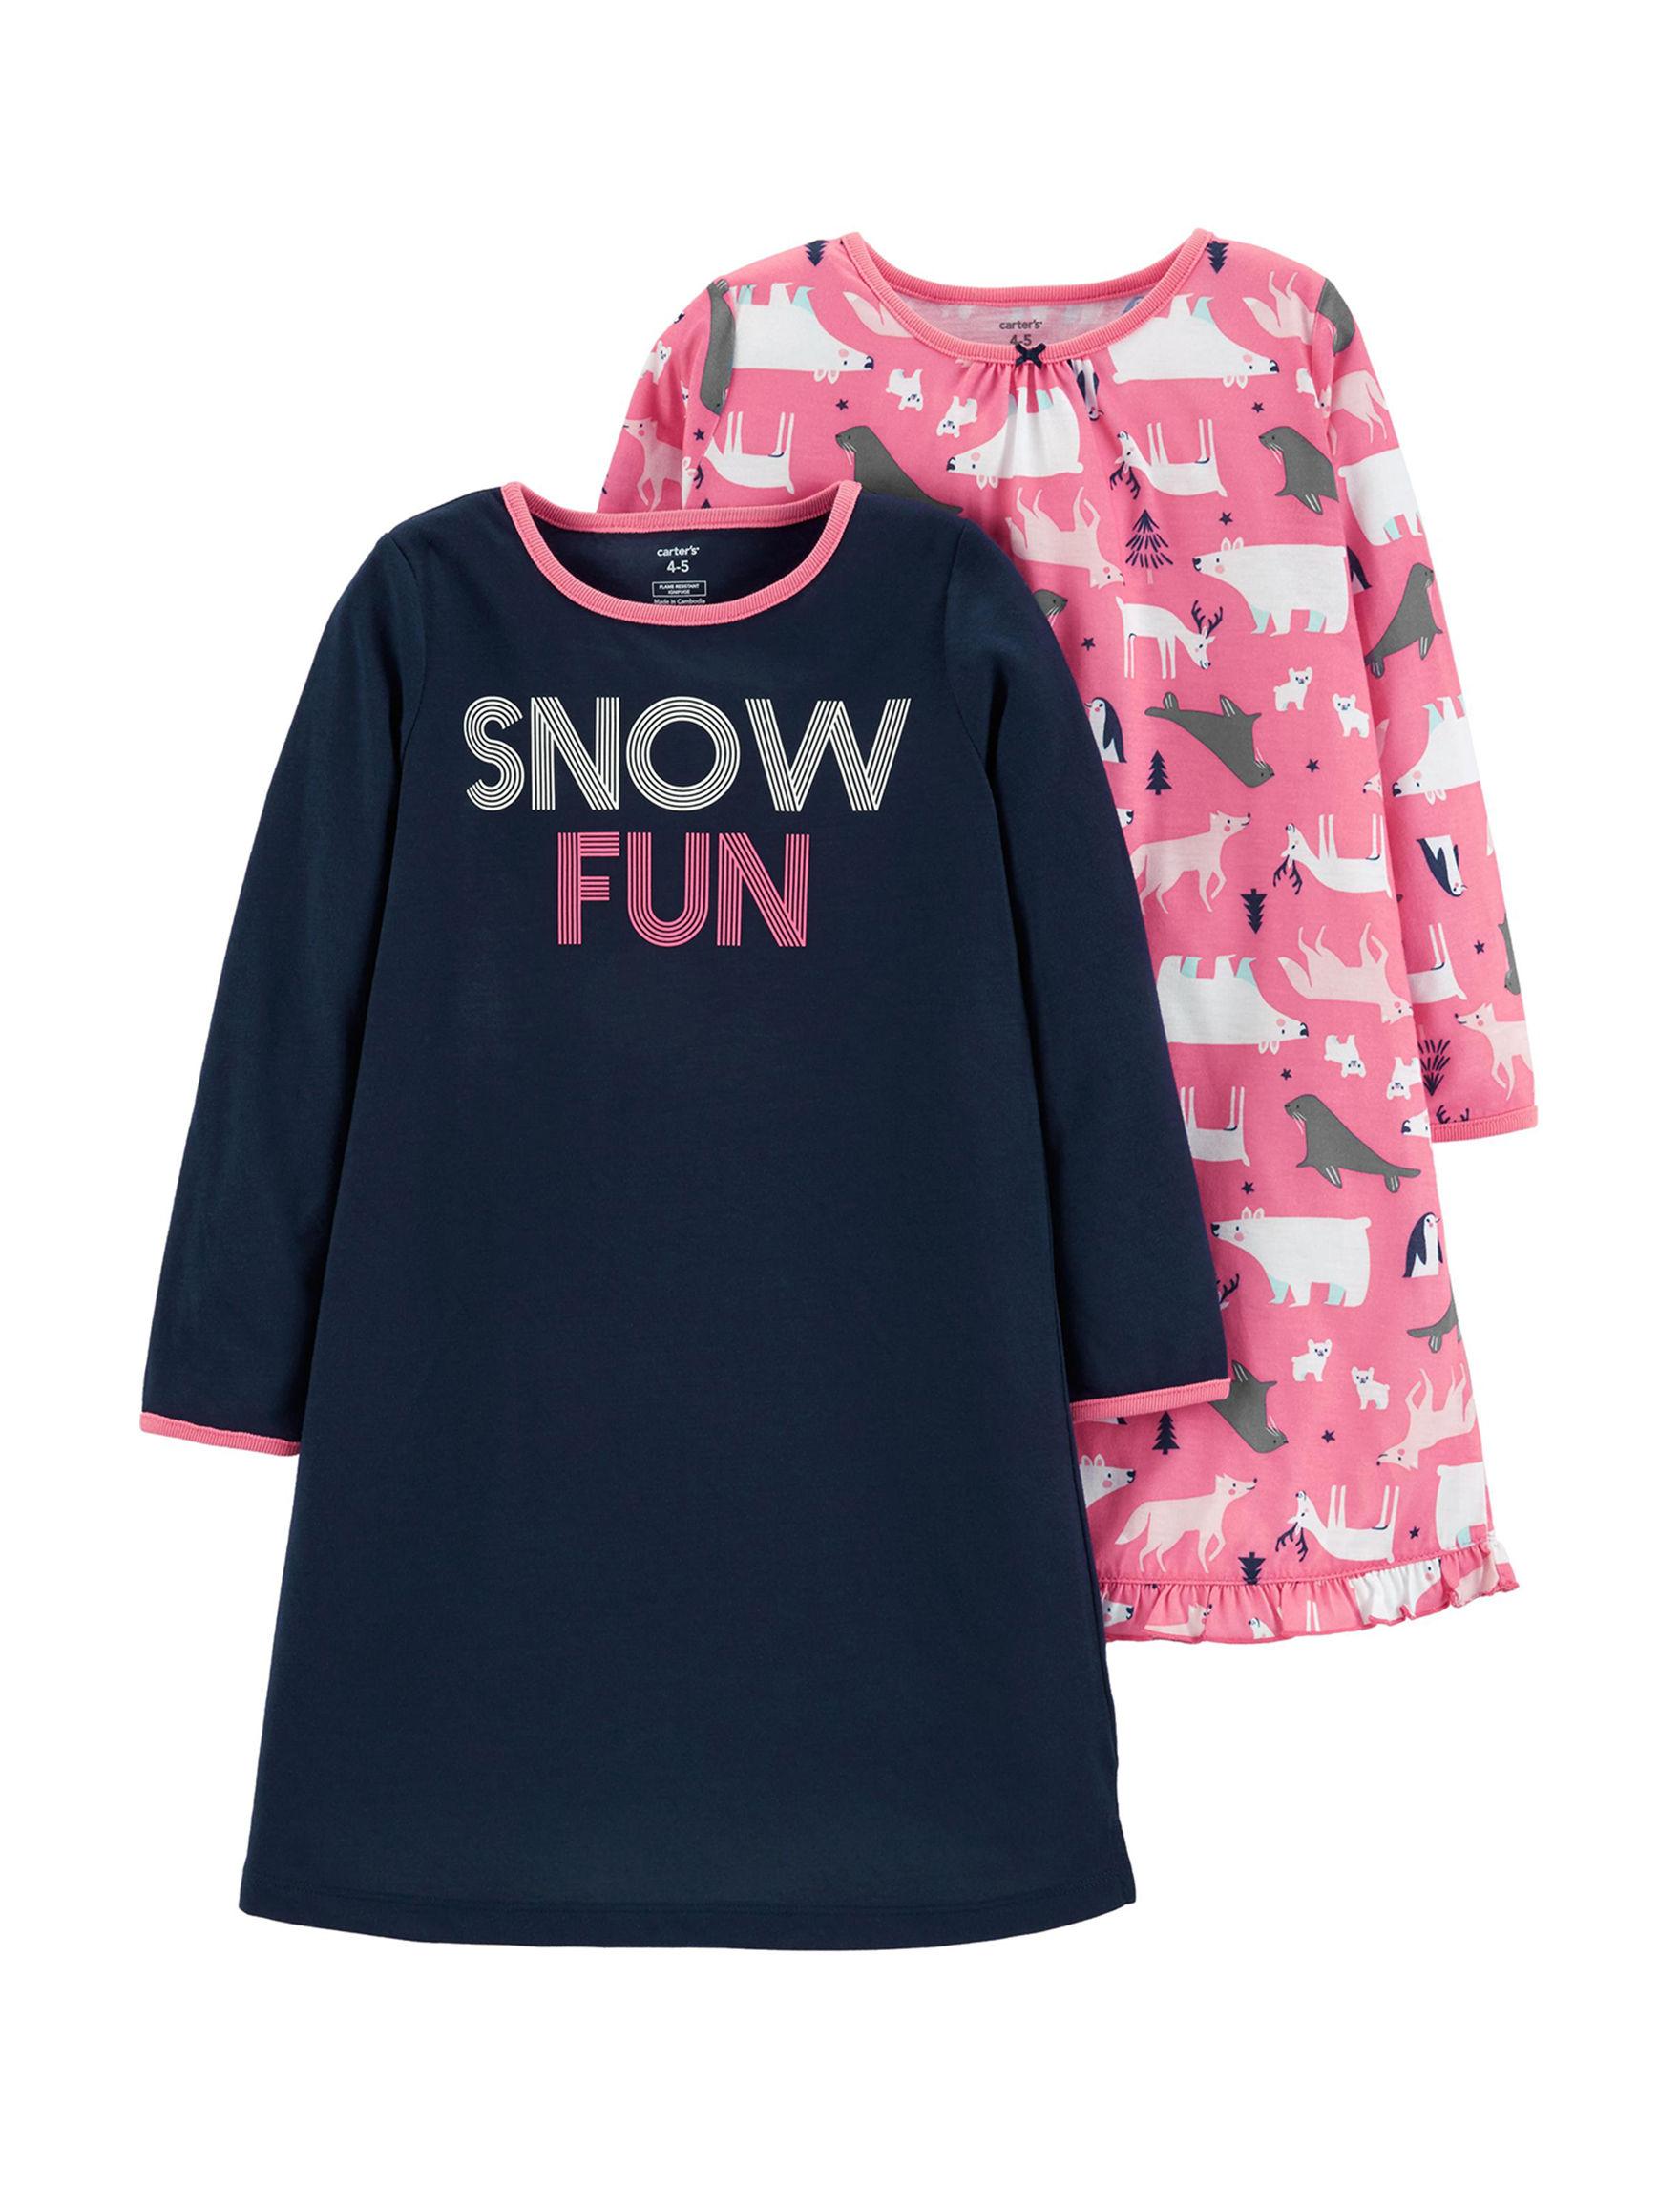 Carter's Black / Pink Nightgowns & Sleep Shirts